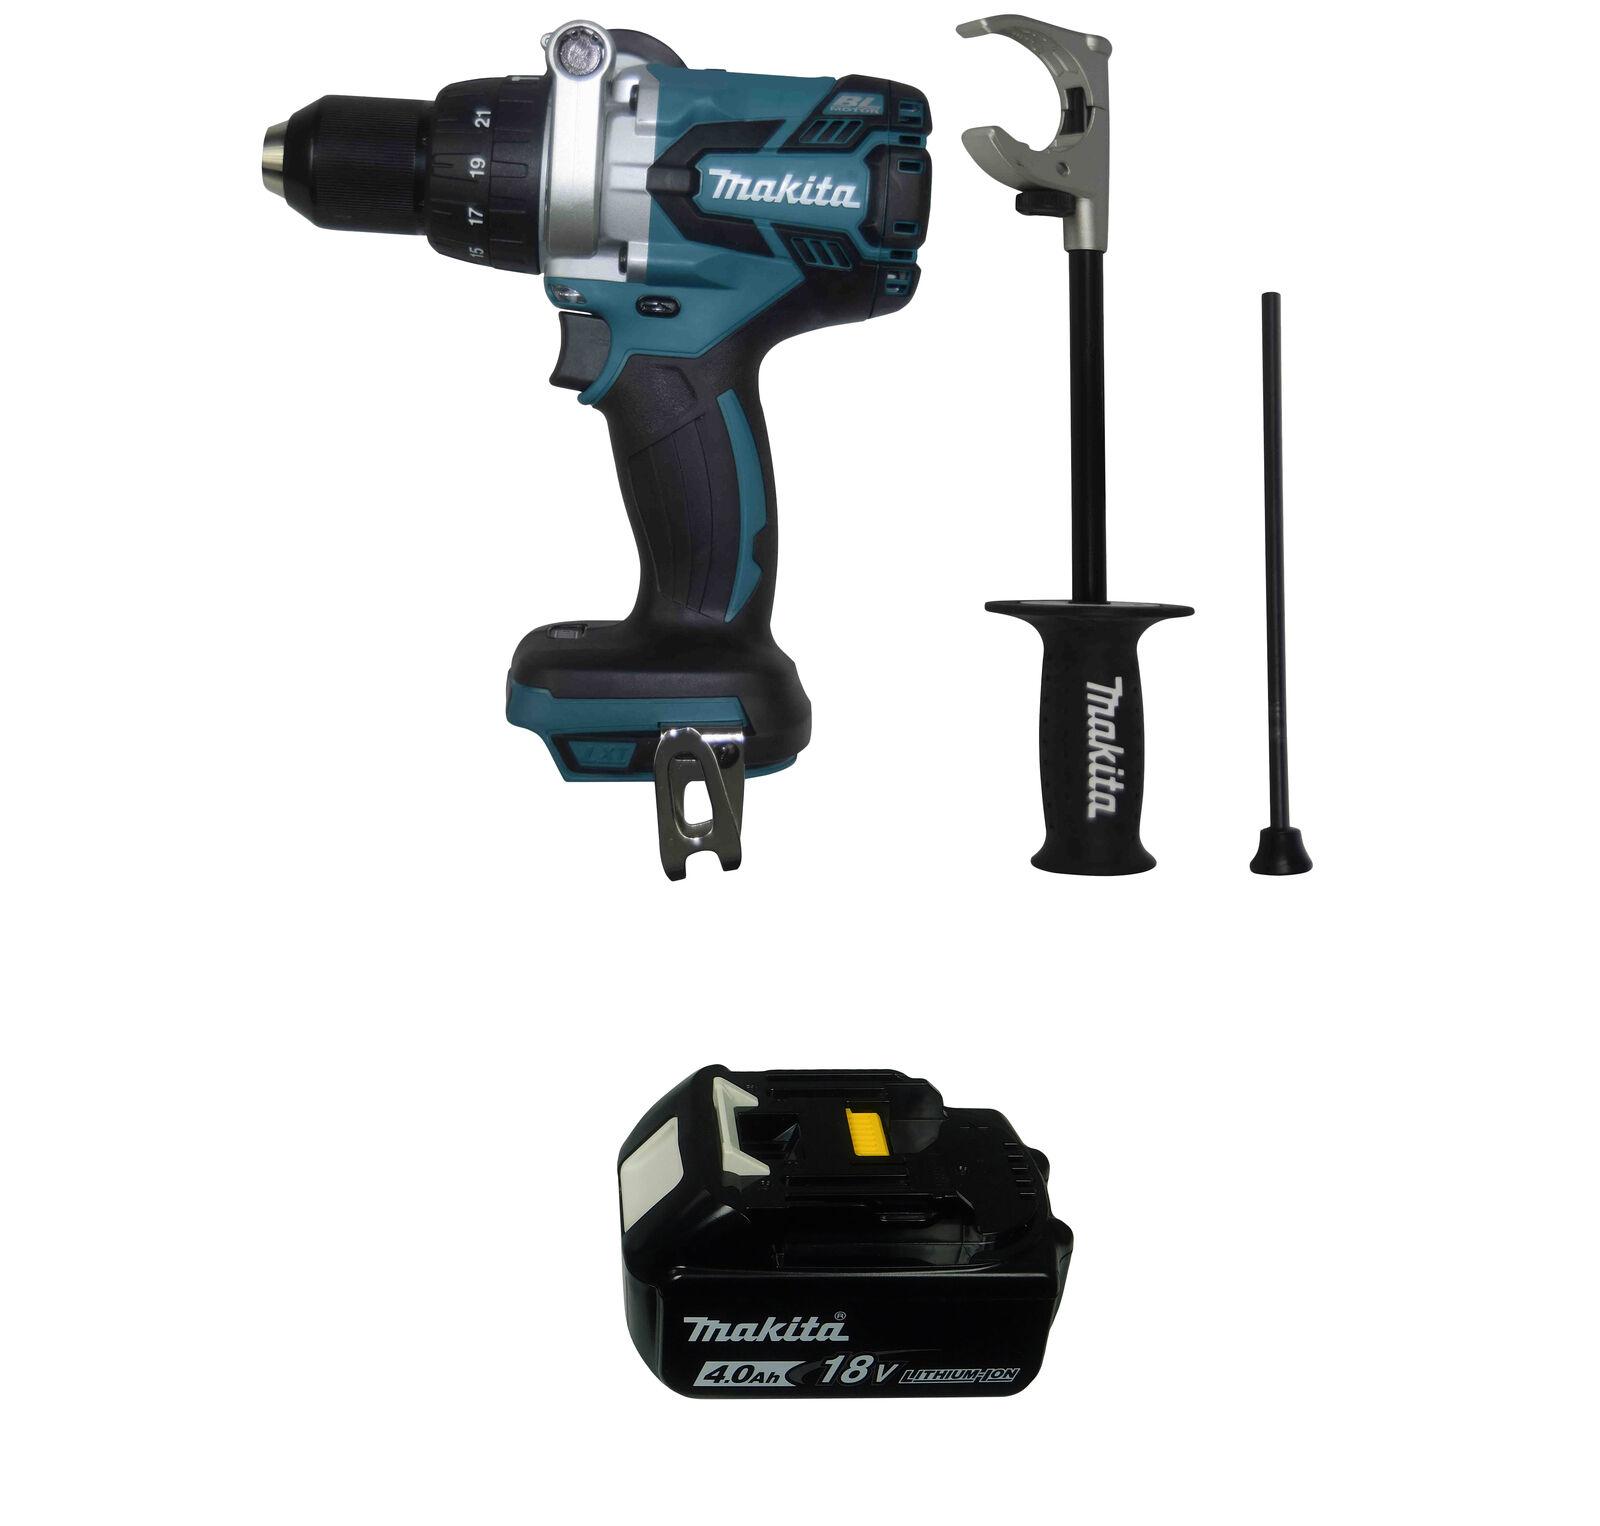 Makita XPH07Z 18V 1/2 in. Hammer Driver Drill w/ BL1840B 18V 4.0Ah Battery. Buy it now for 153.95